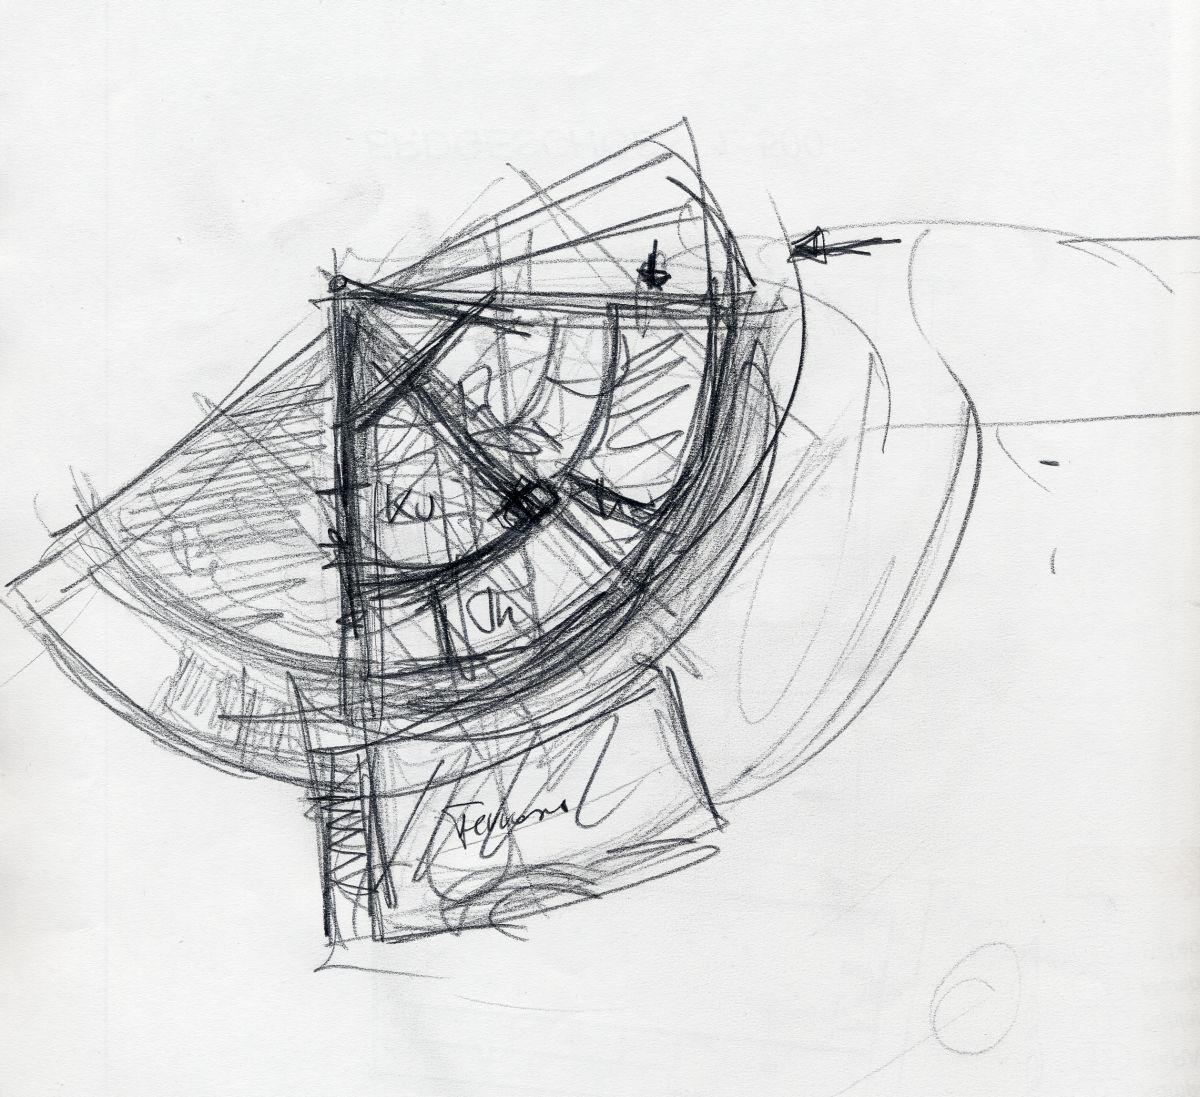 Architekturbüro DI Oliver Vykruta